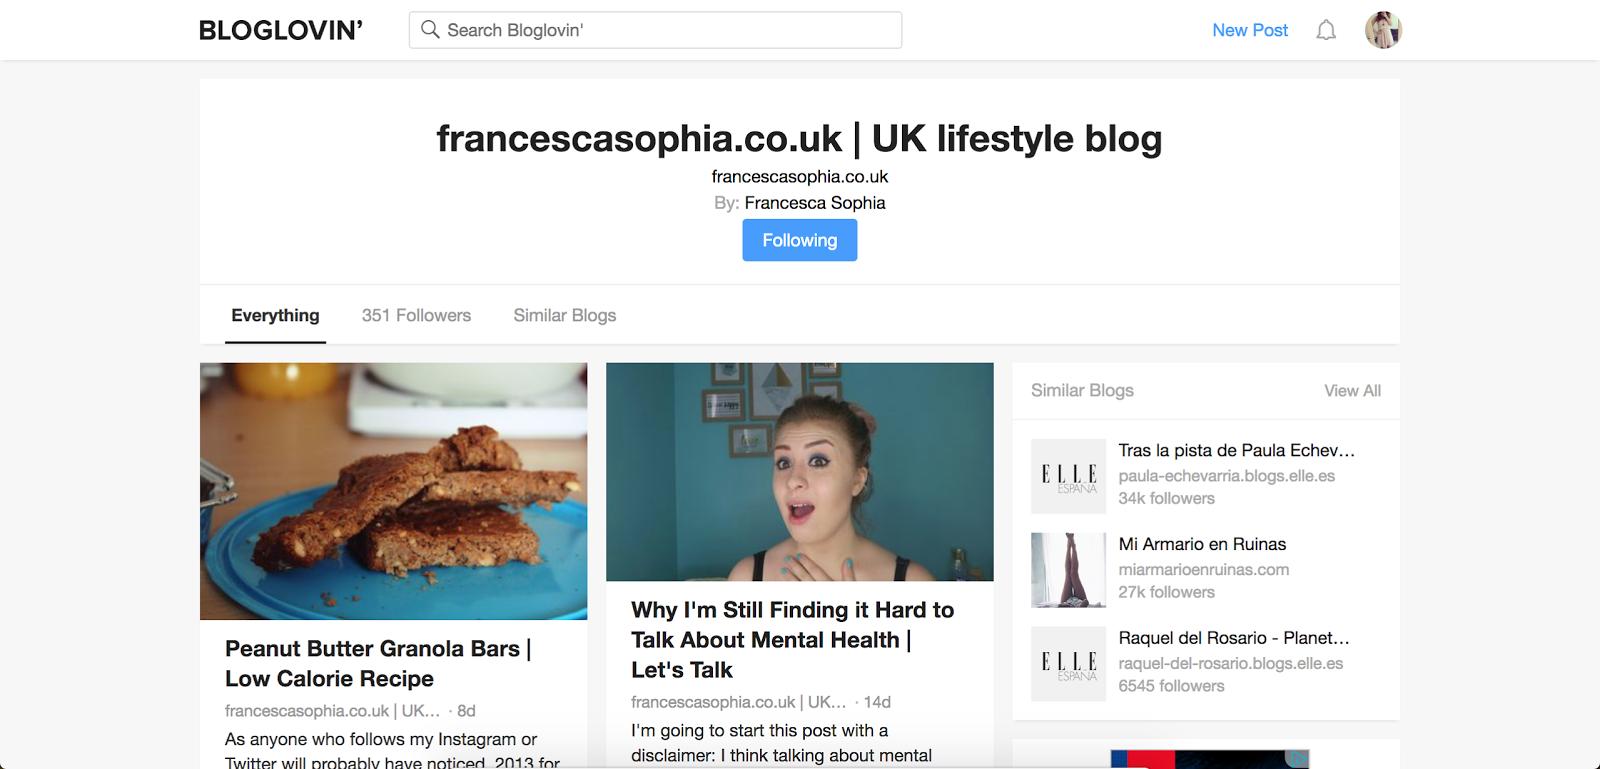 screenshot of the bloglovin' page from francescasophia.co.uk